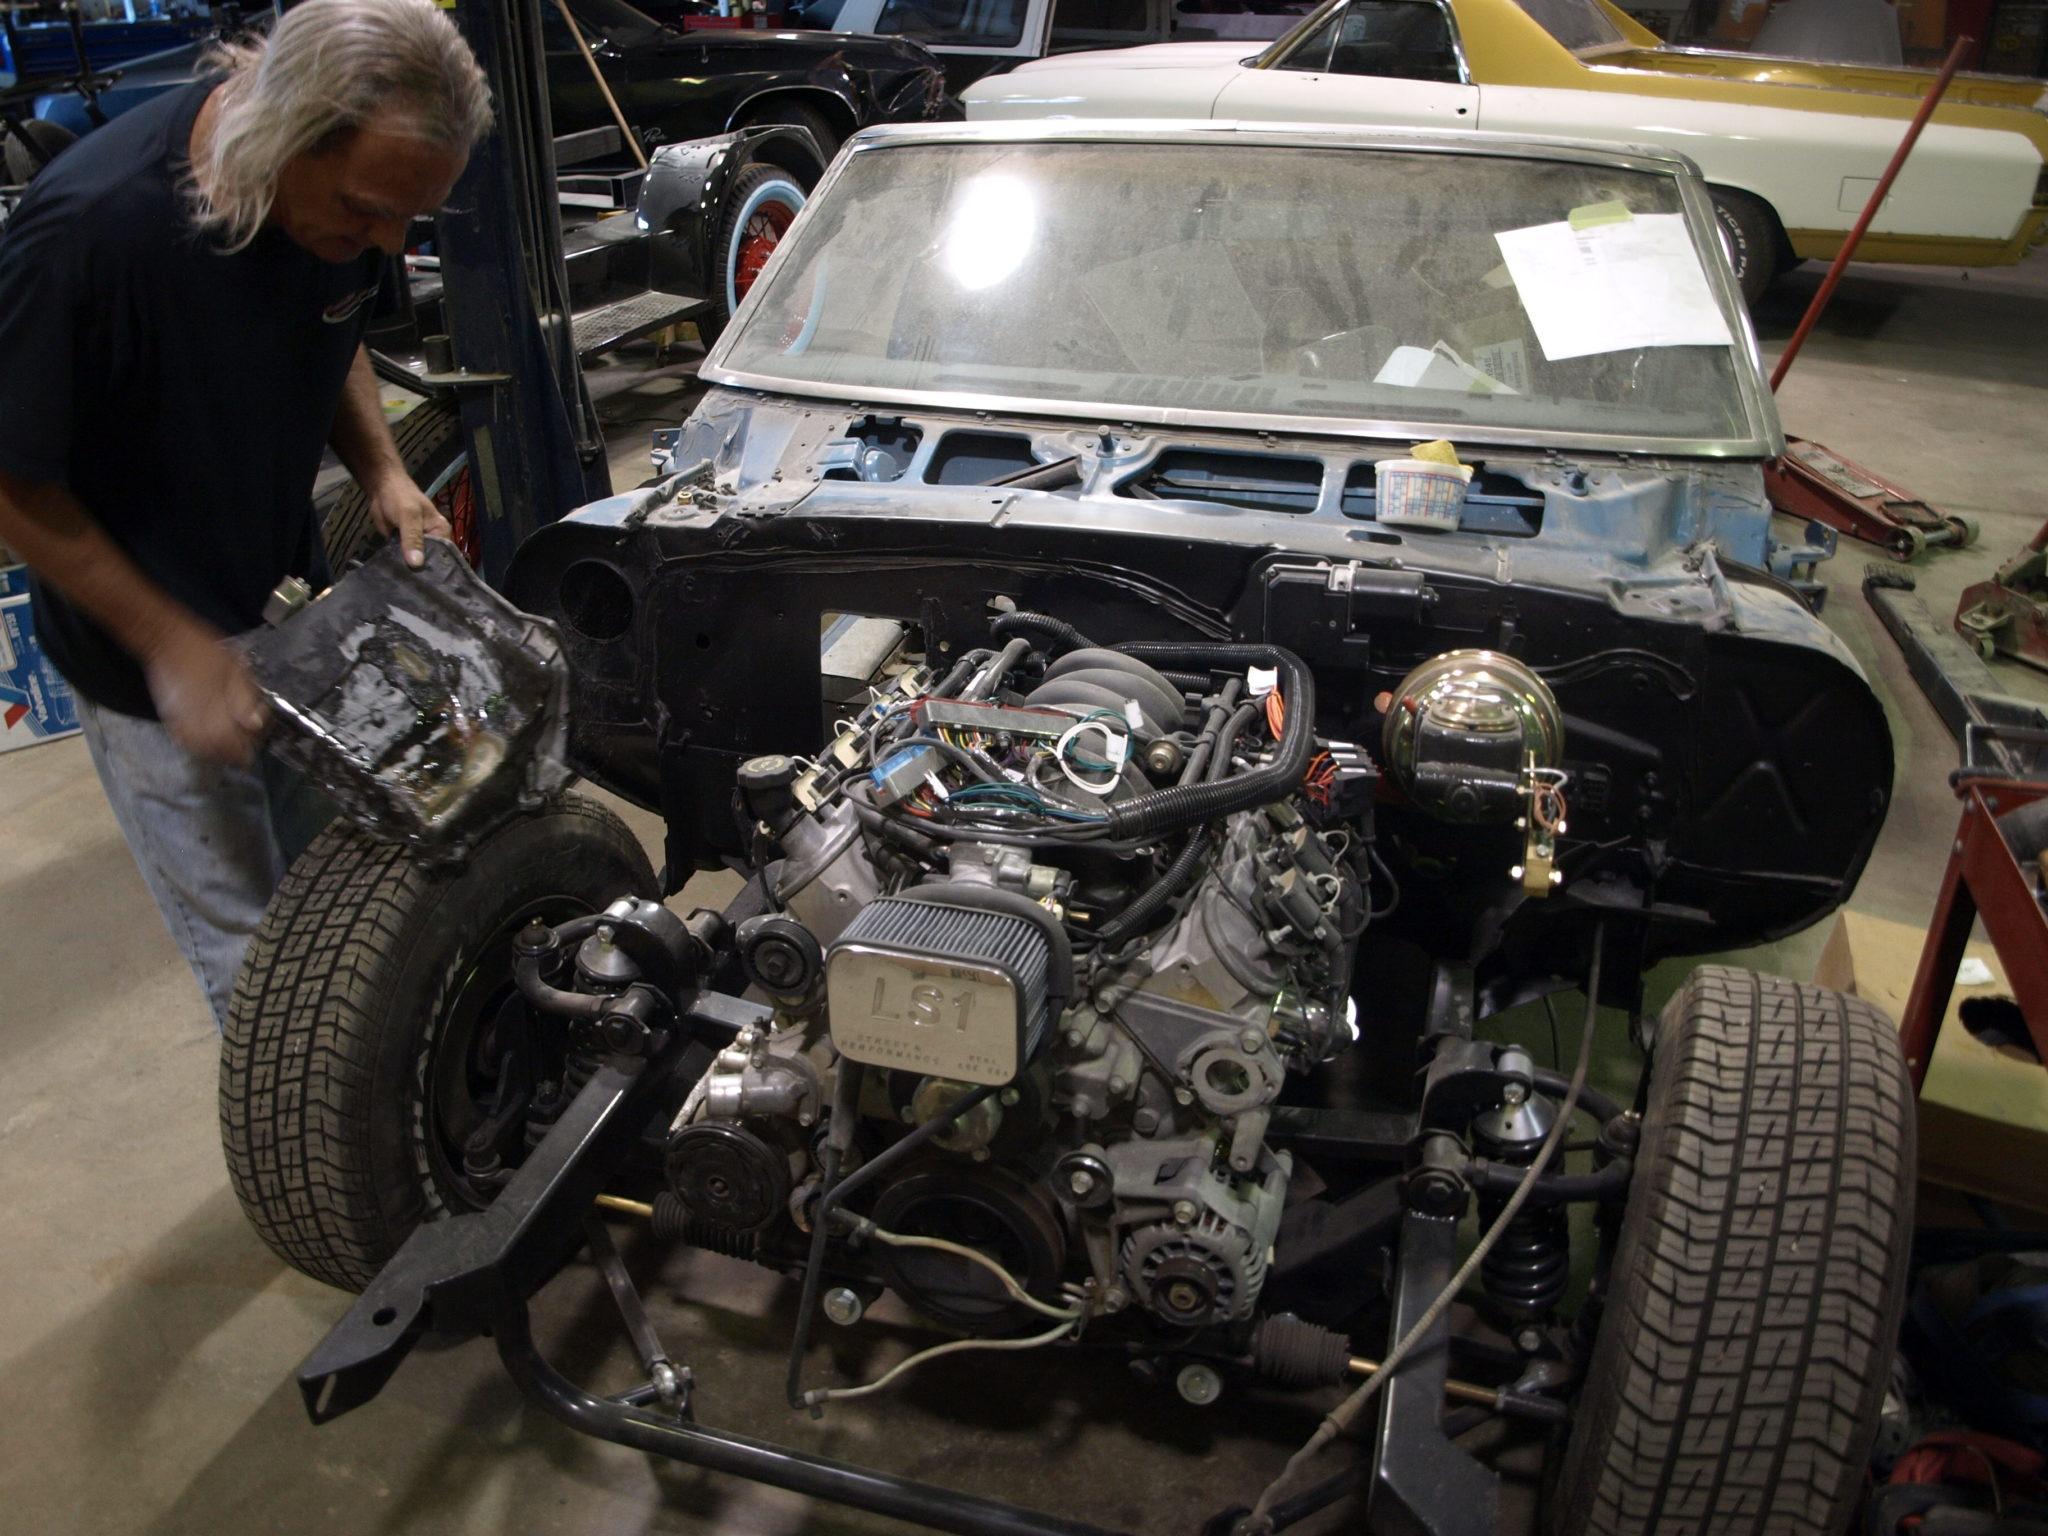 P7127050 1967 chevy camaro precision car restoration 1967 camaro fuse box at gsmx.co